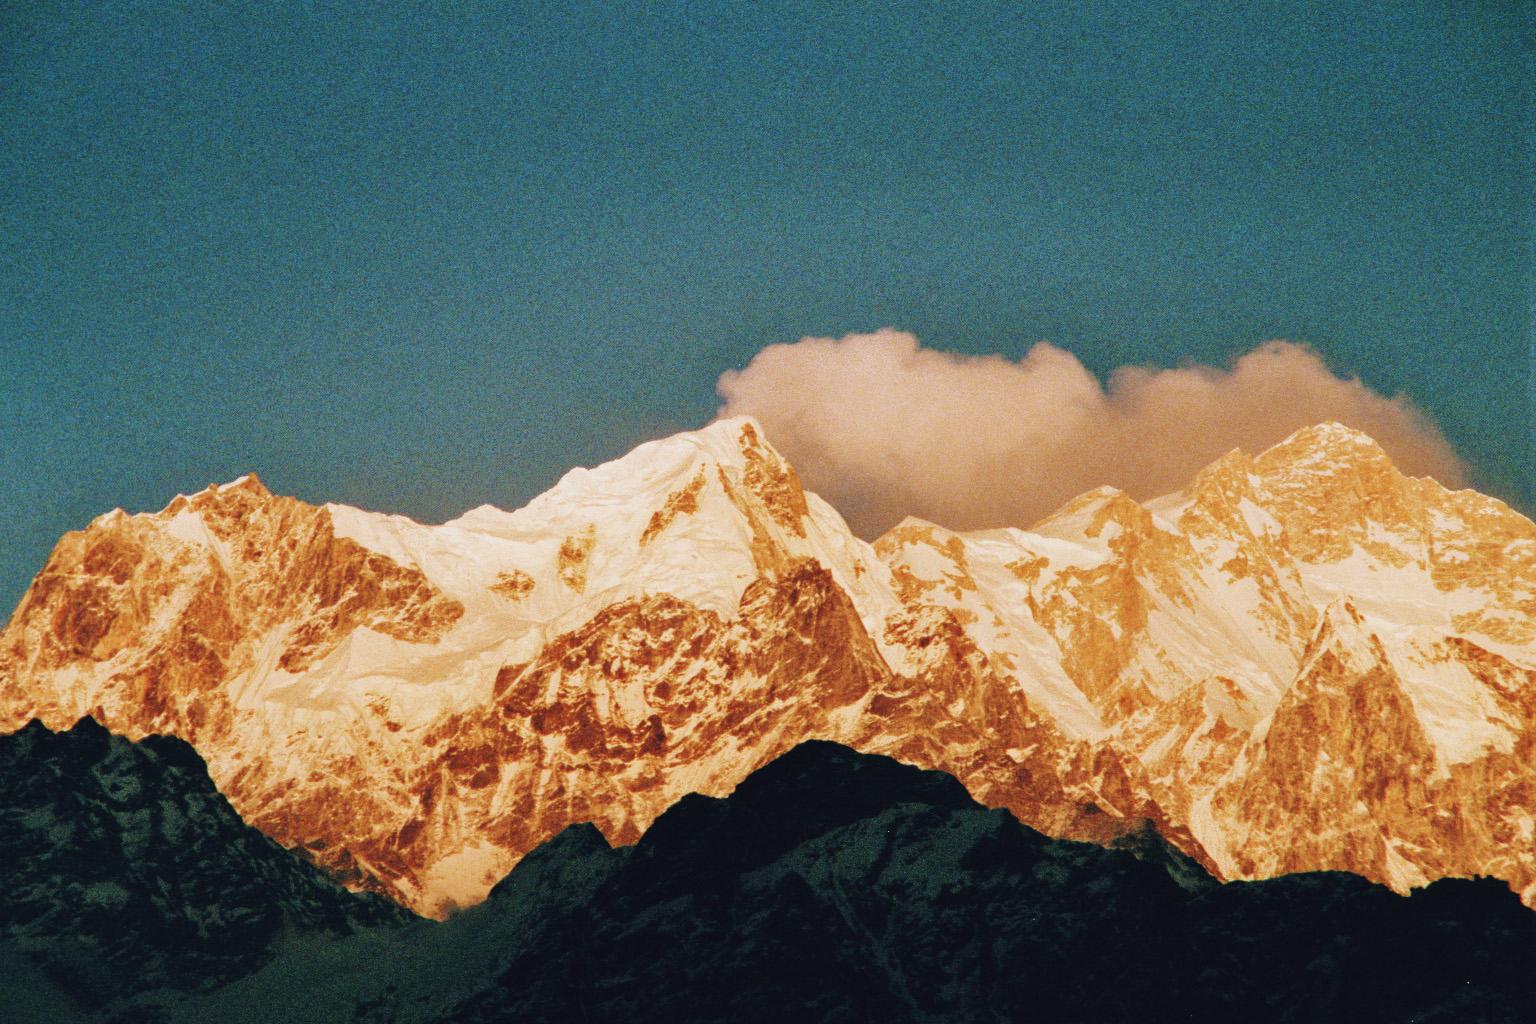 nicola-odemann-nepal-les-others-11